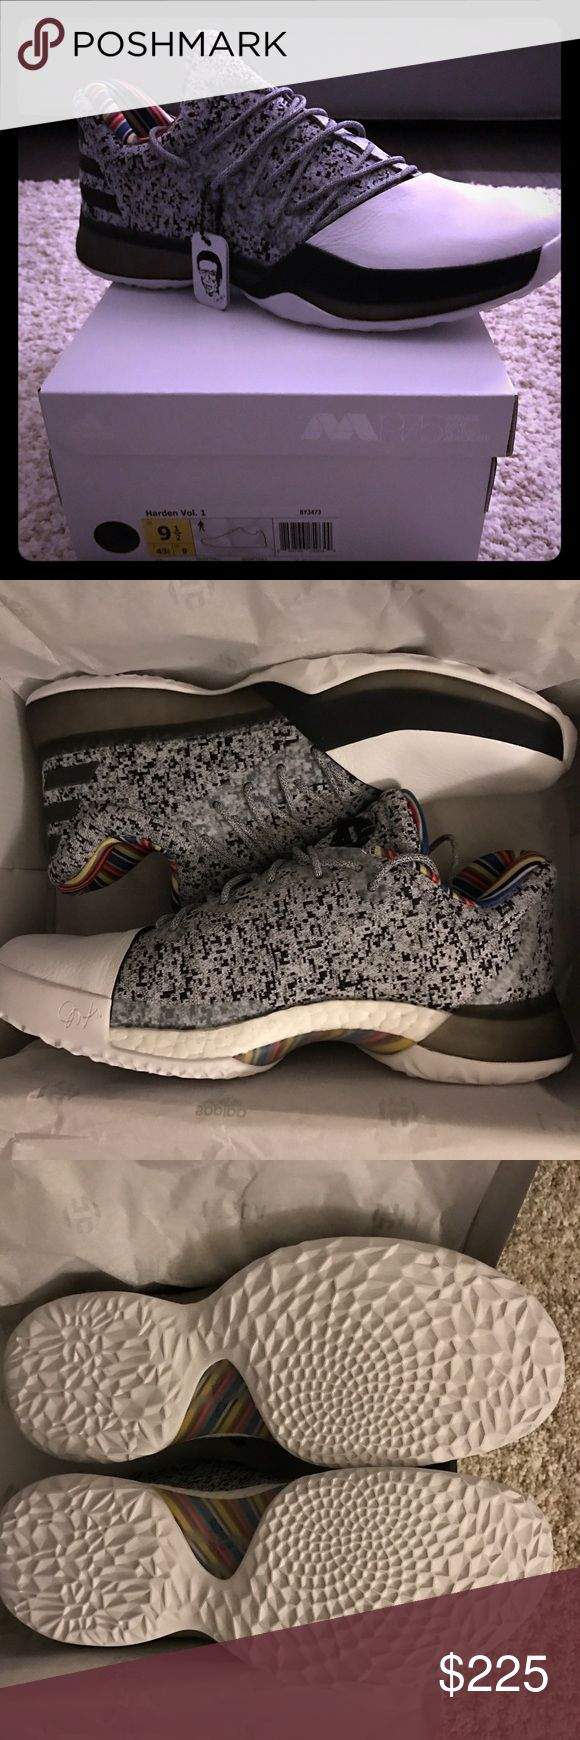 sports shoes 75b37 befb3 In celebration of Black History Month, adidas Pantofi casual LE COQ SPORTIF  pentru femei ARTHUR ASHE INT W VELVET 1520721 shoes Pinterest ...